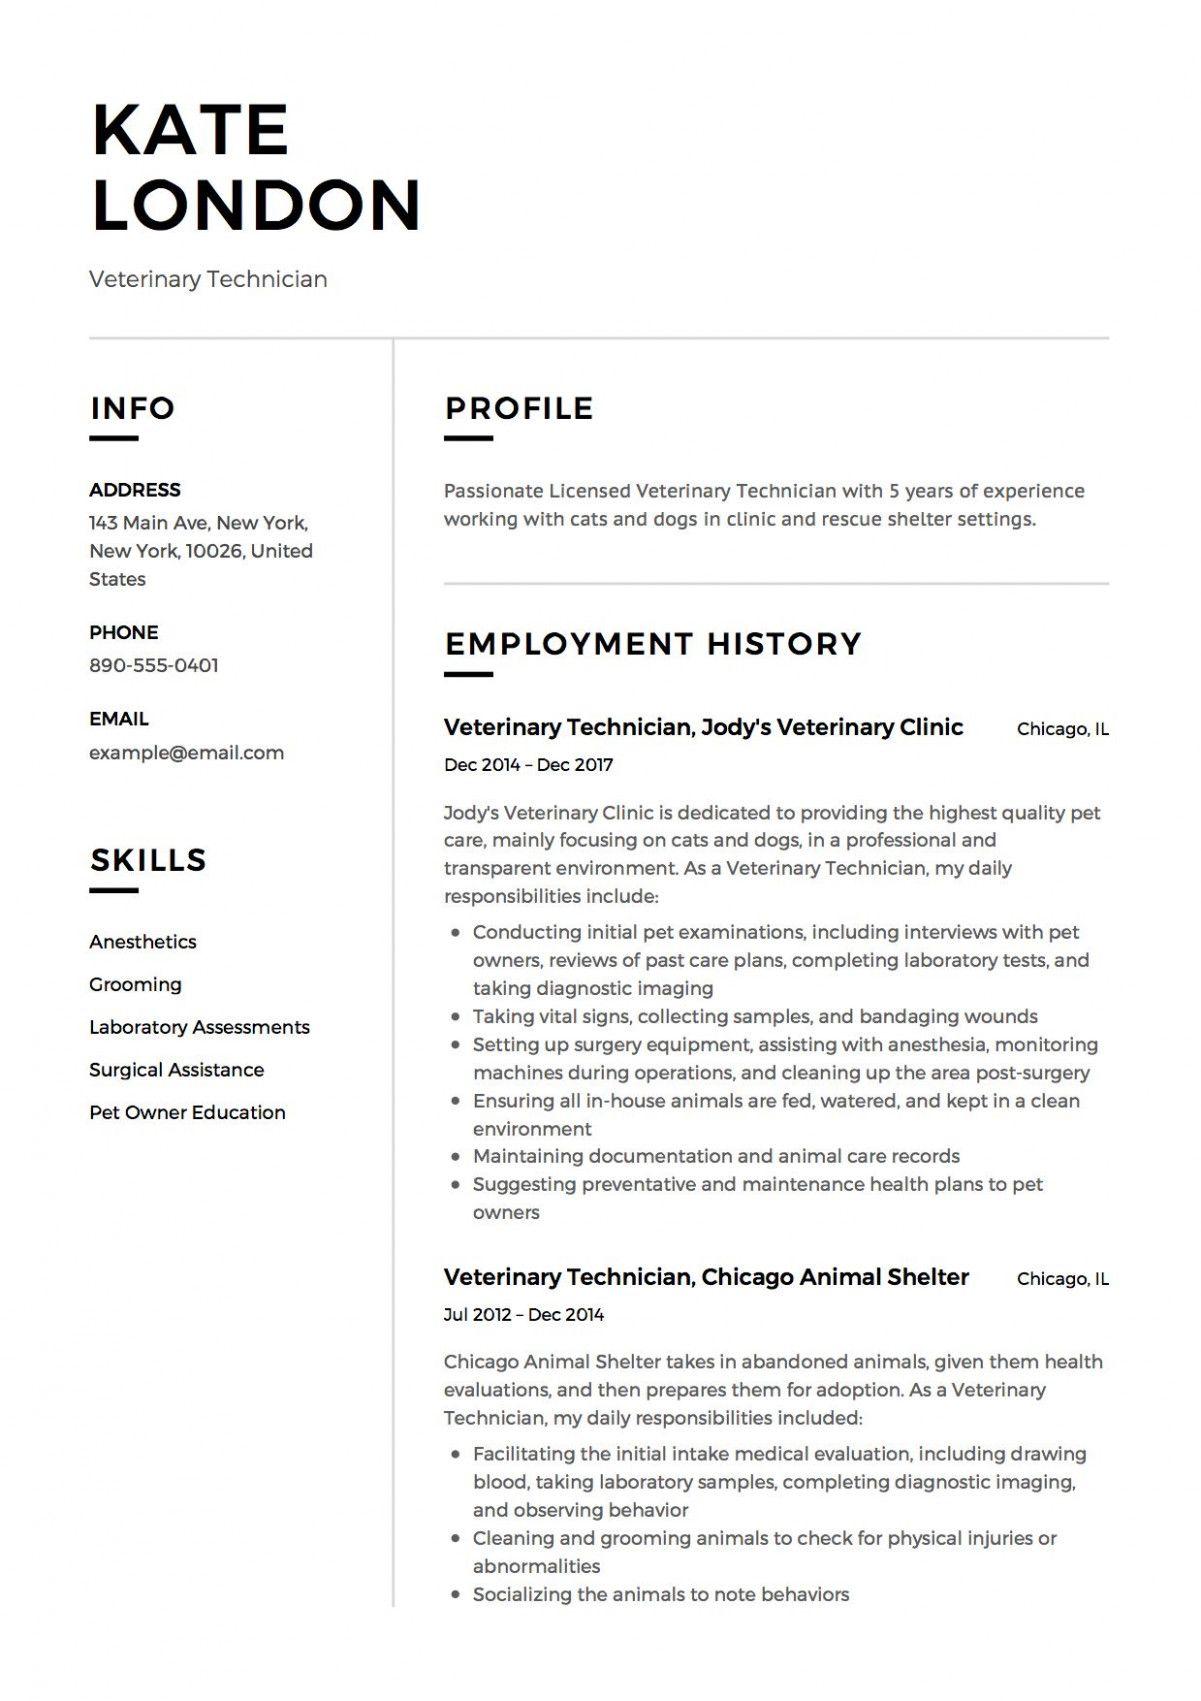 11 Vet Tech Resume Samples in 2020 Resume examples